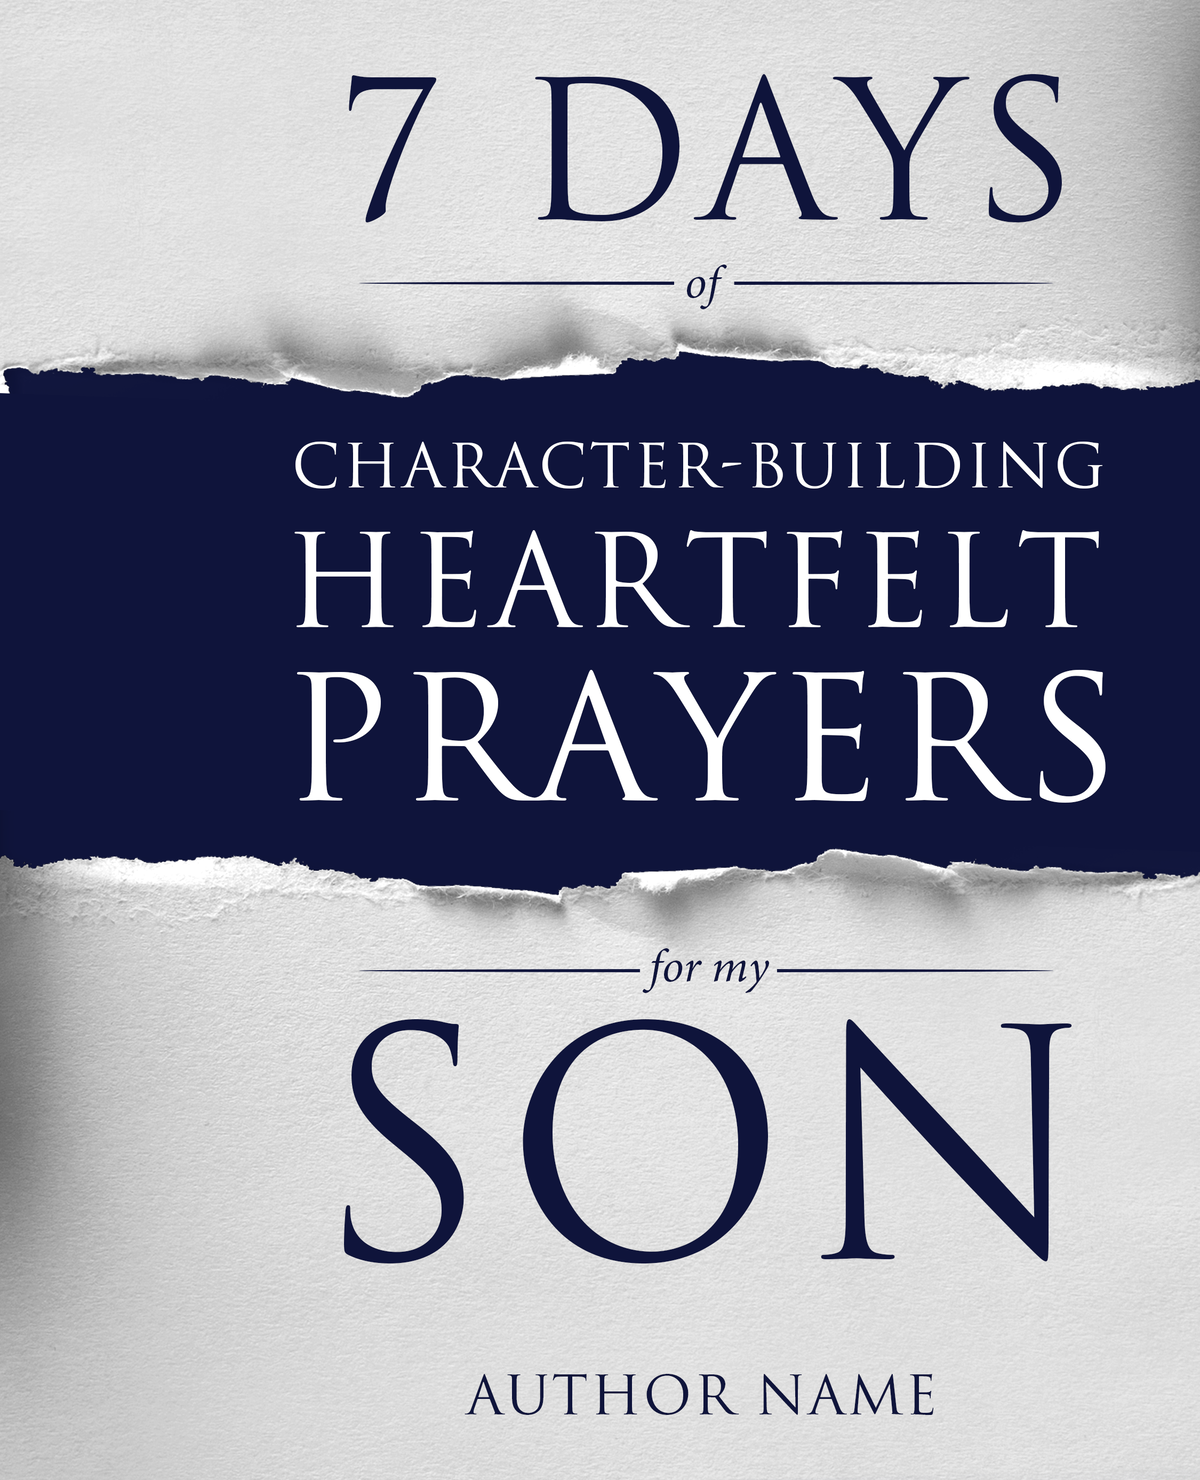 Prayer / Devotional cover